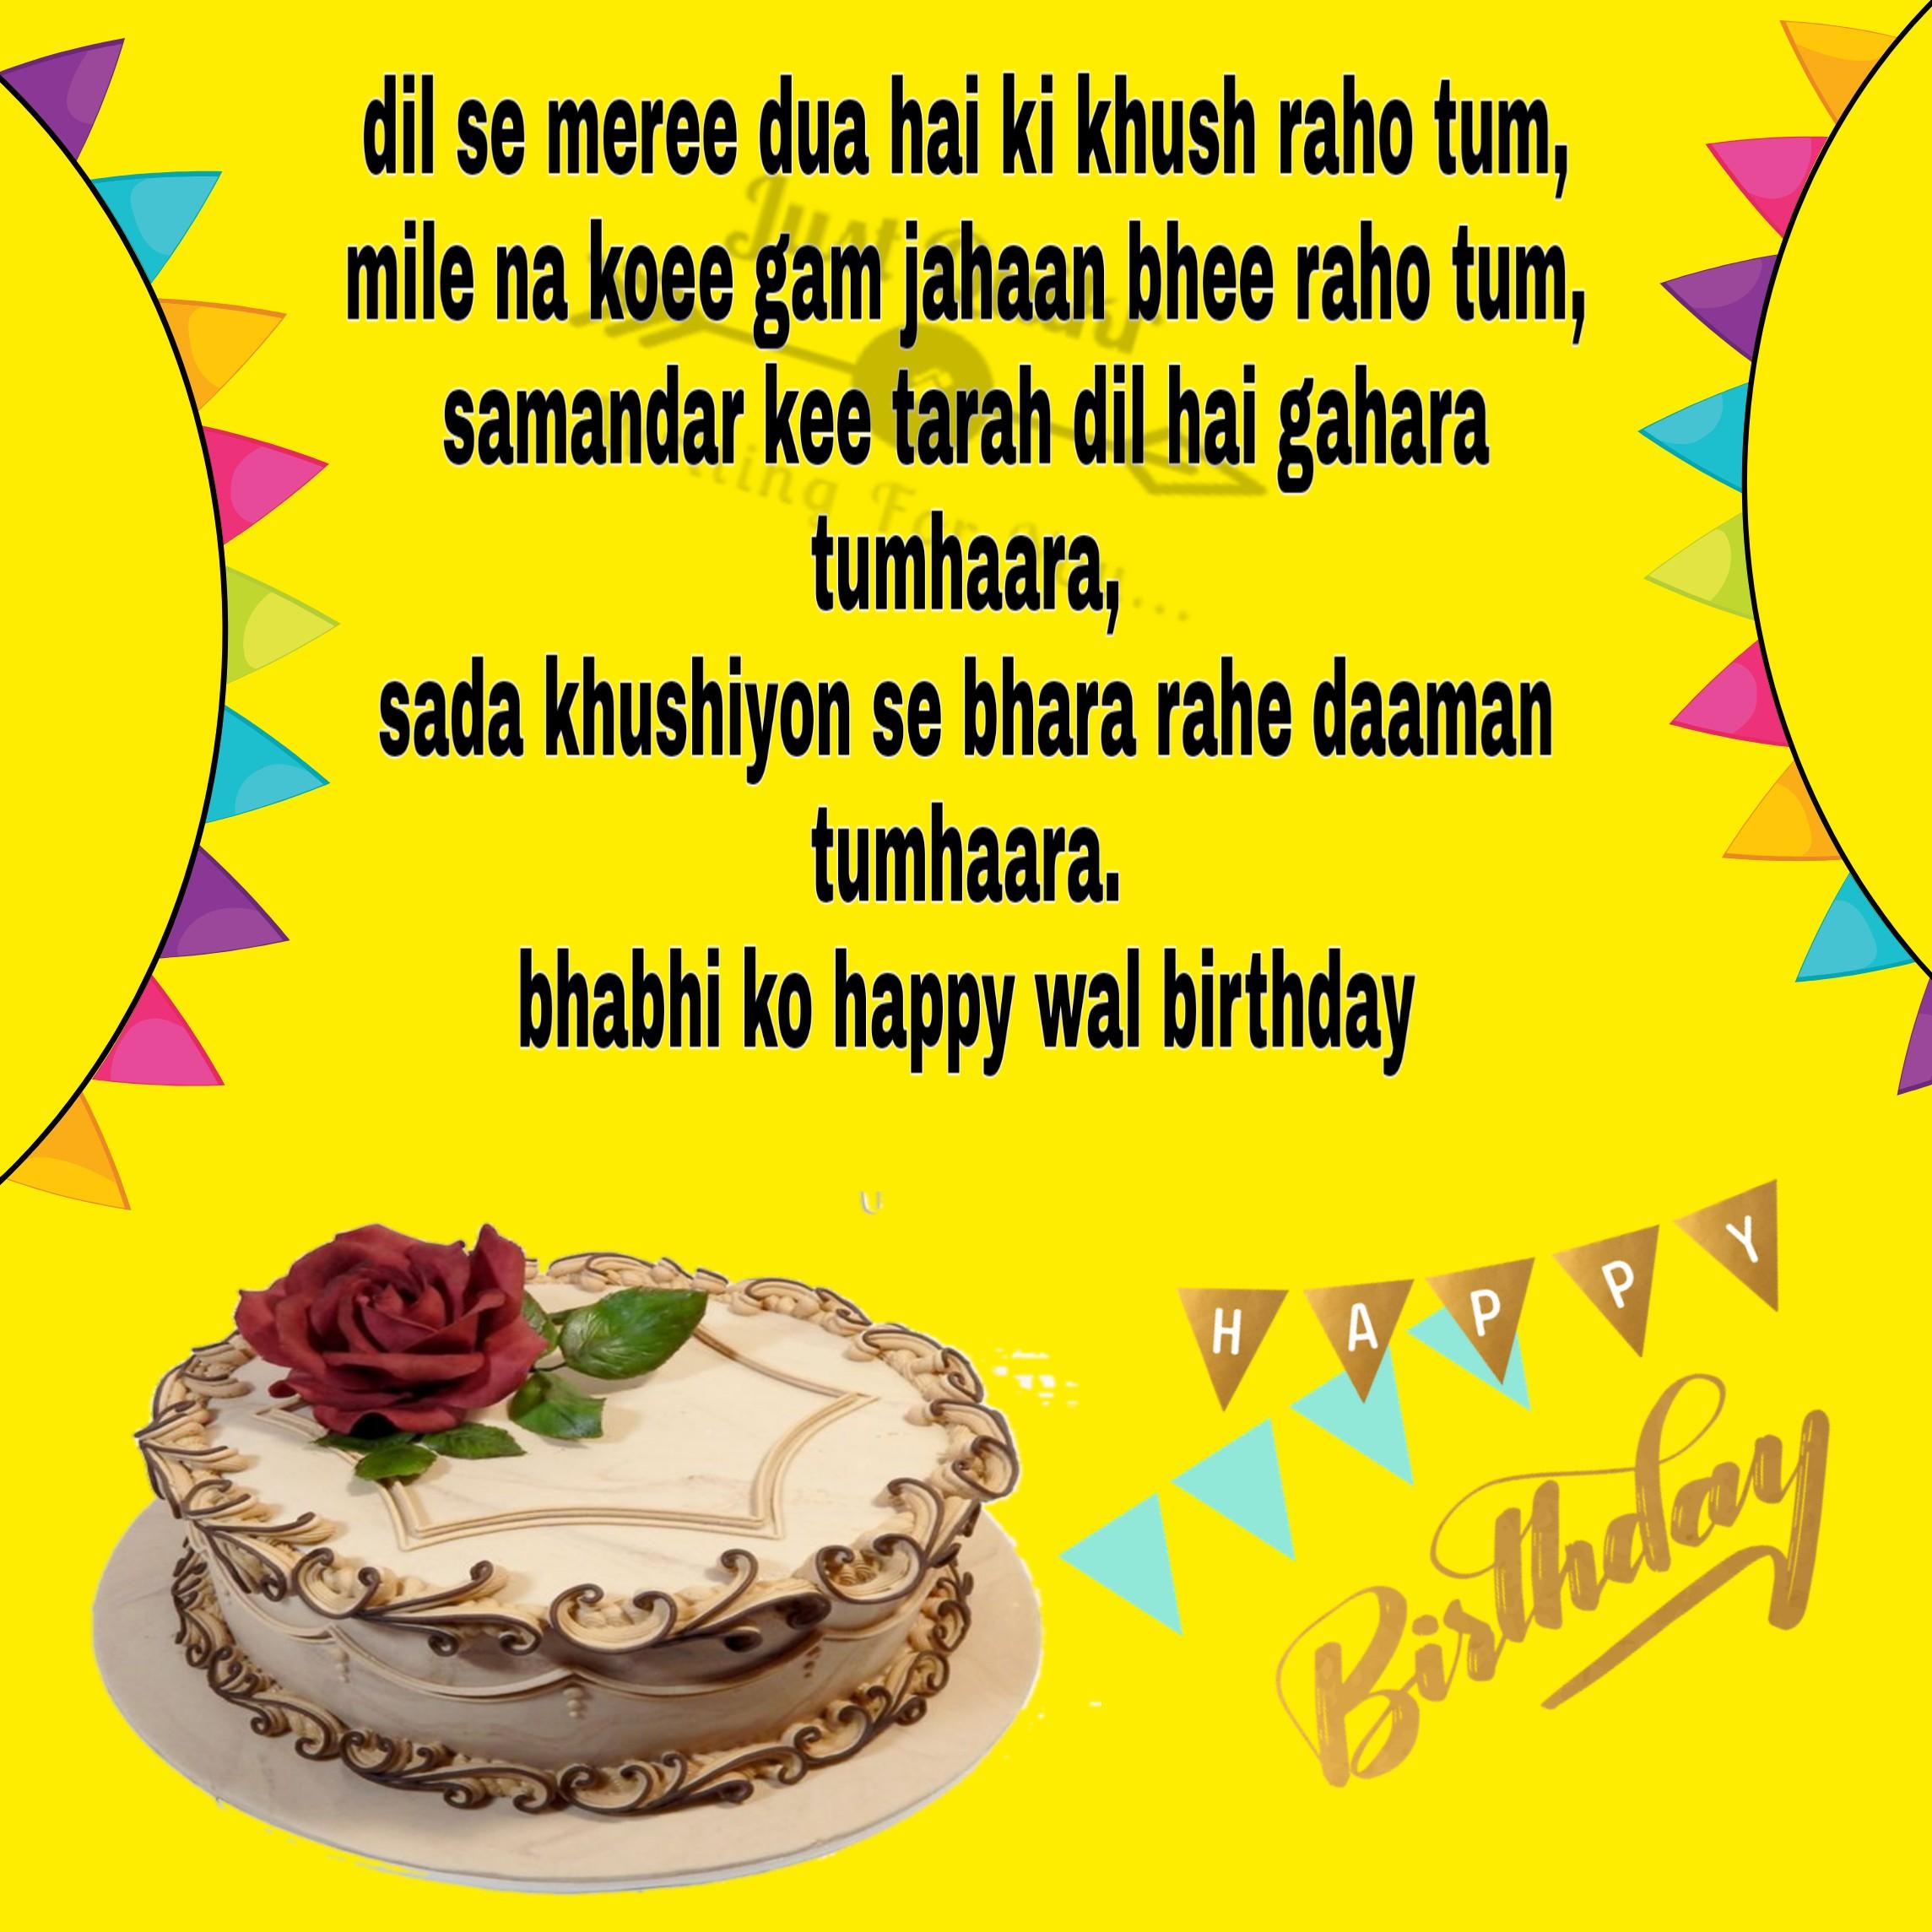 Happy Birthday Cake HD Pics Images with Shayari Sayings for Bhabhi Ji